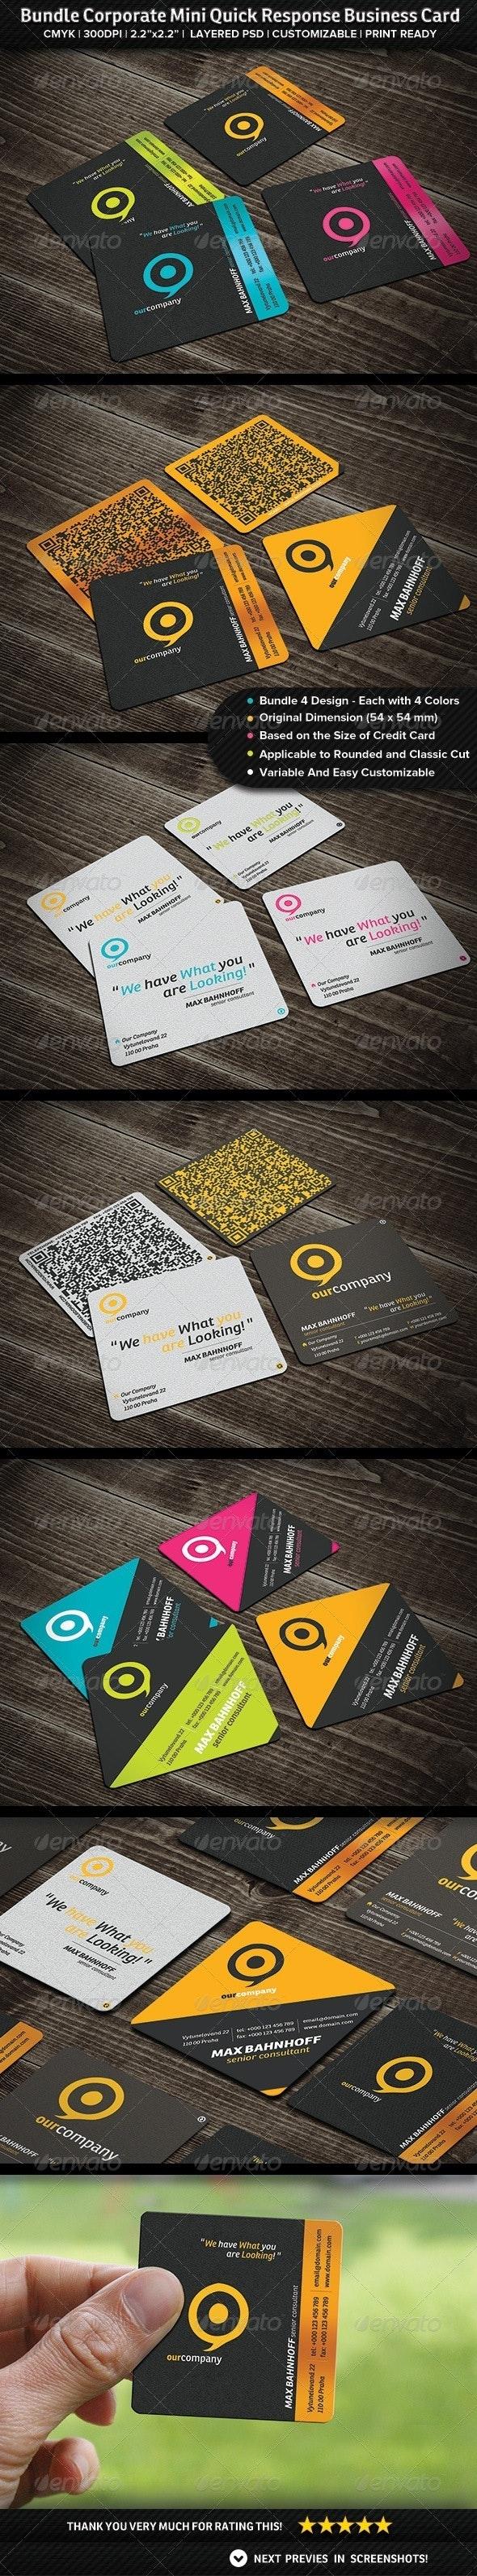 Bundle Corporate Mini Quick Response Business Card - Creative Business Cards